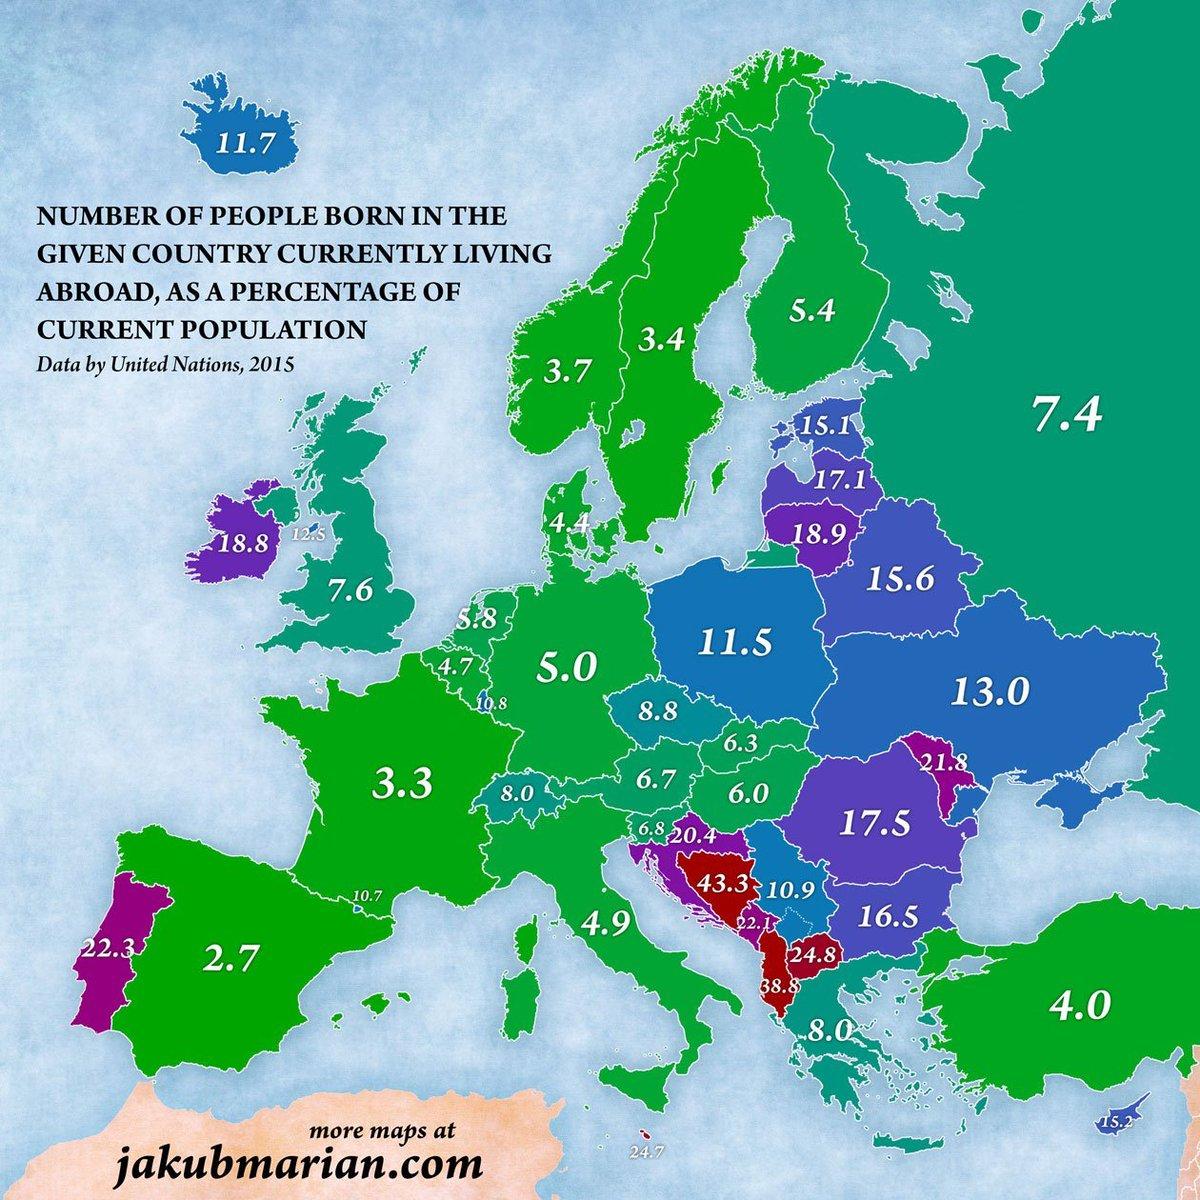 живут заграницей - Европа